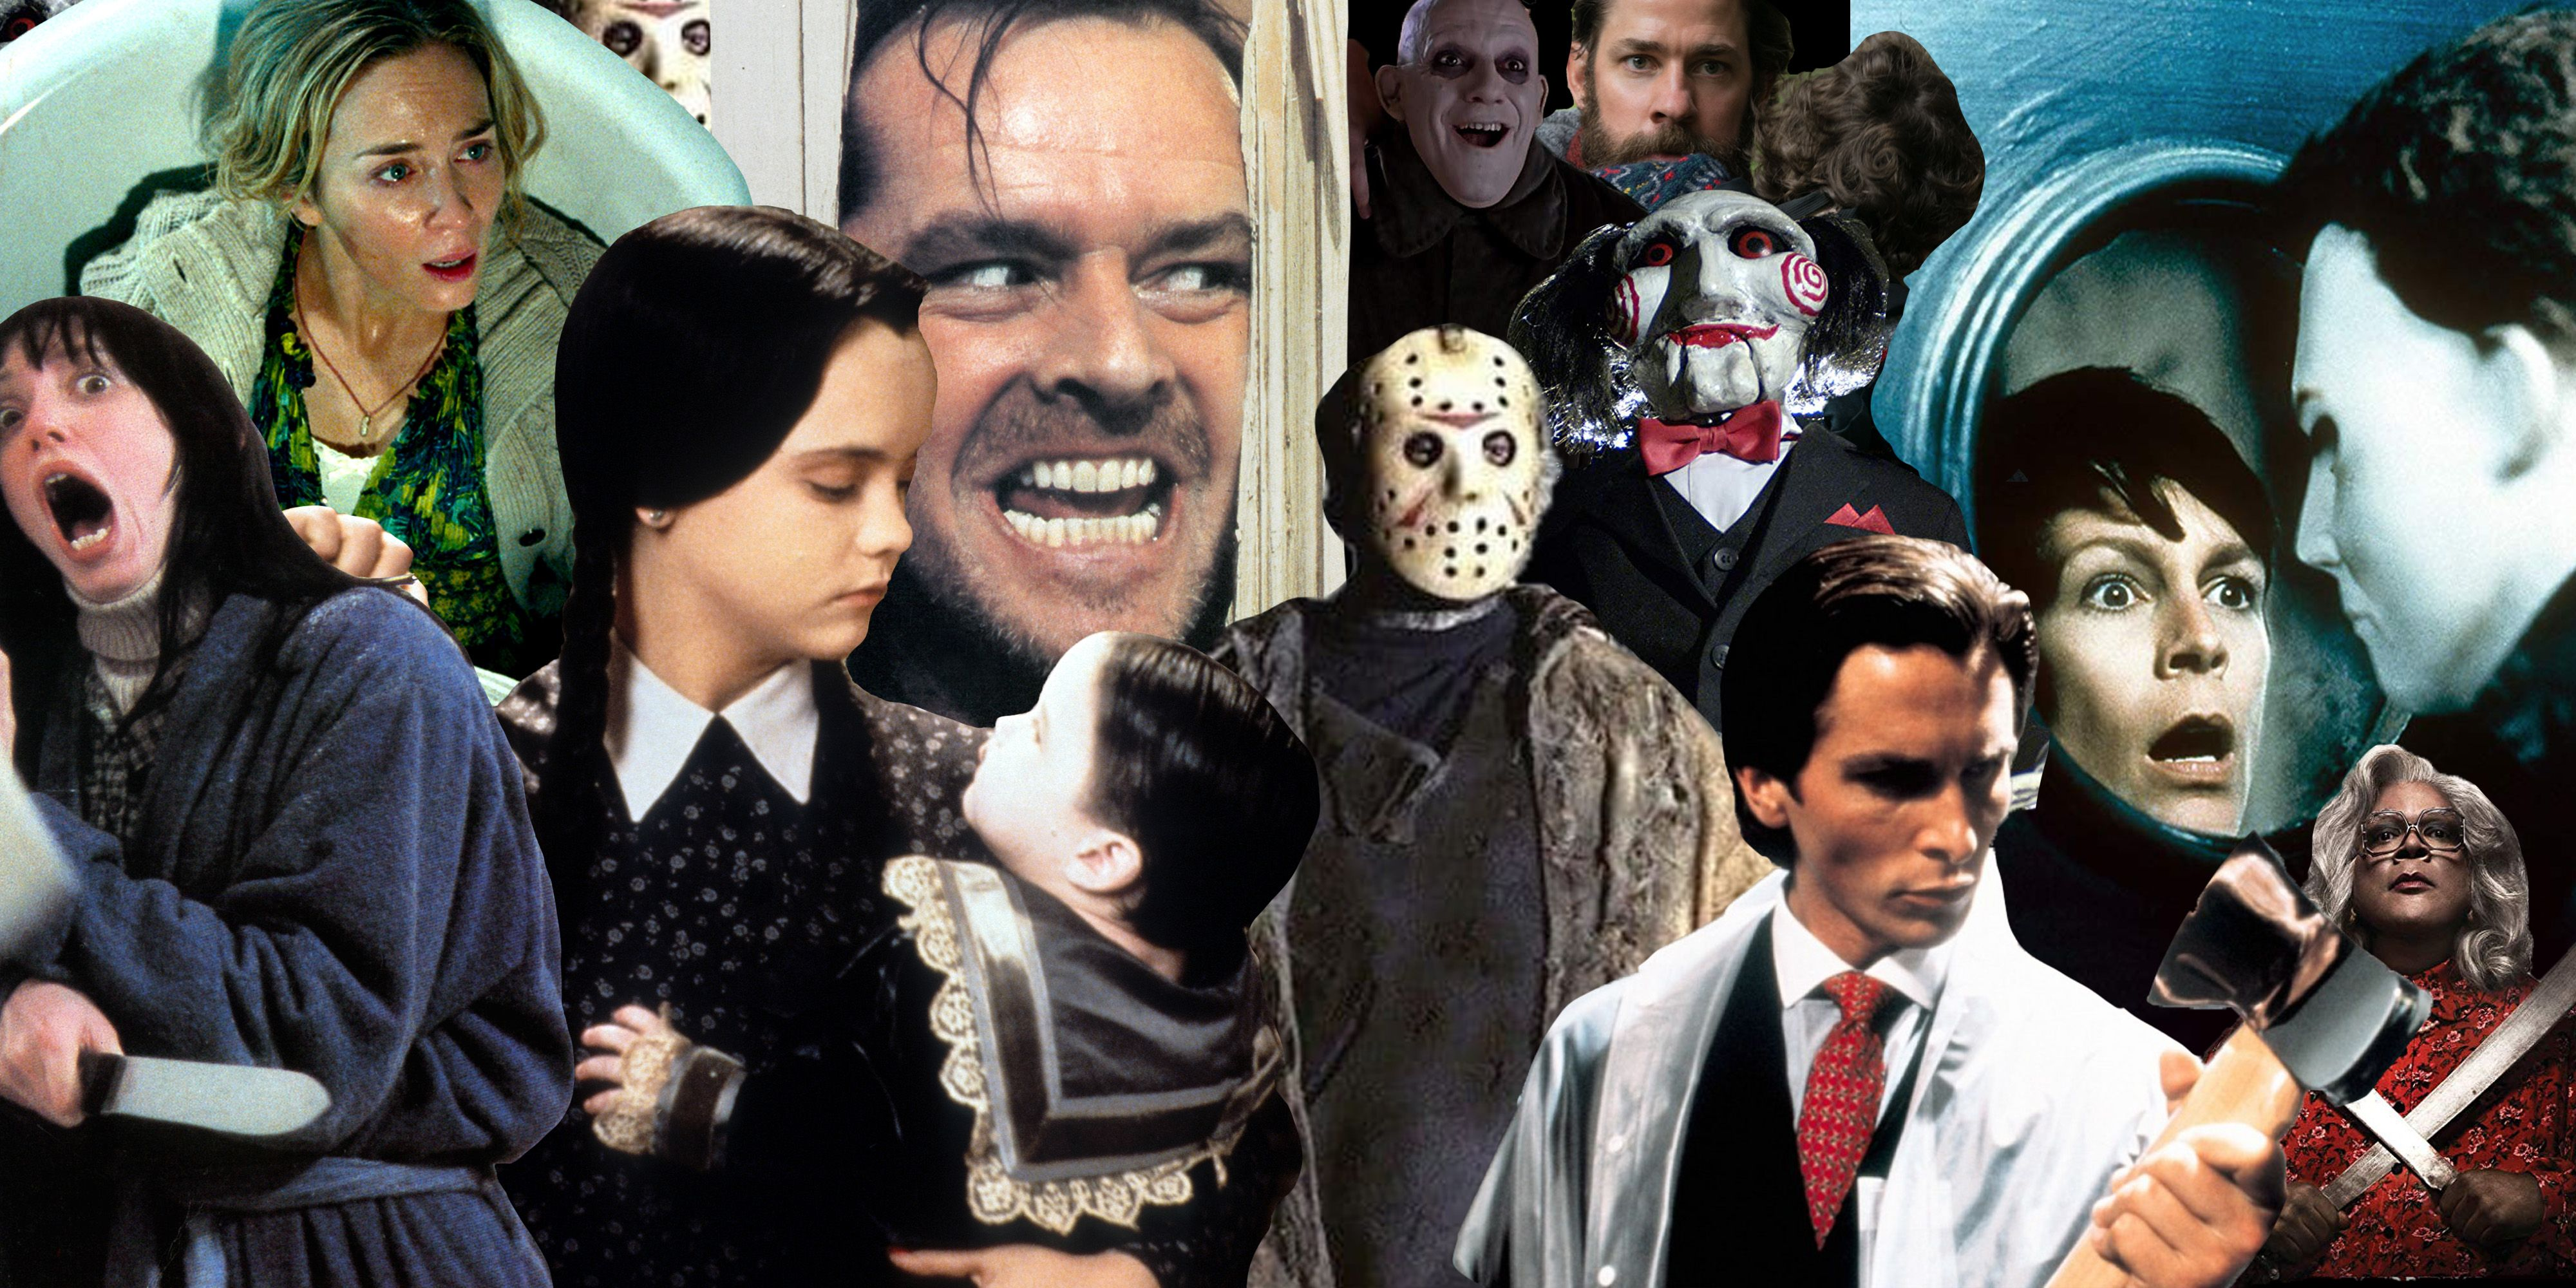 20 Best Halloween Movies on Hulu 2019 - Hulu Halloween